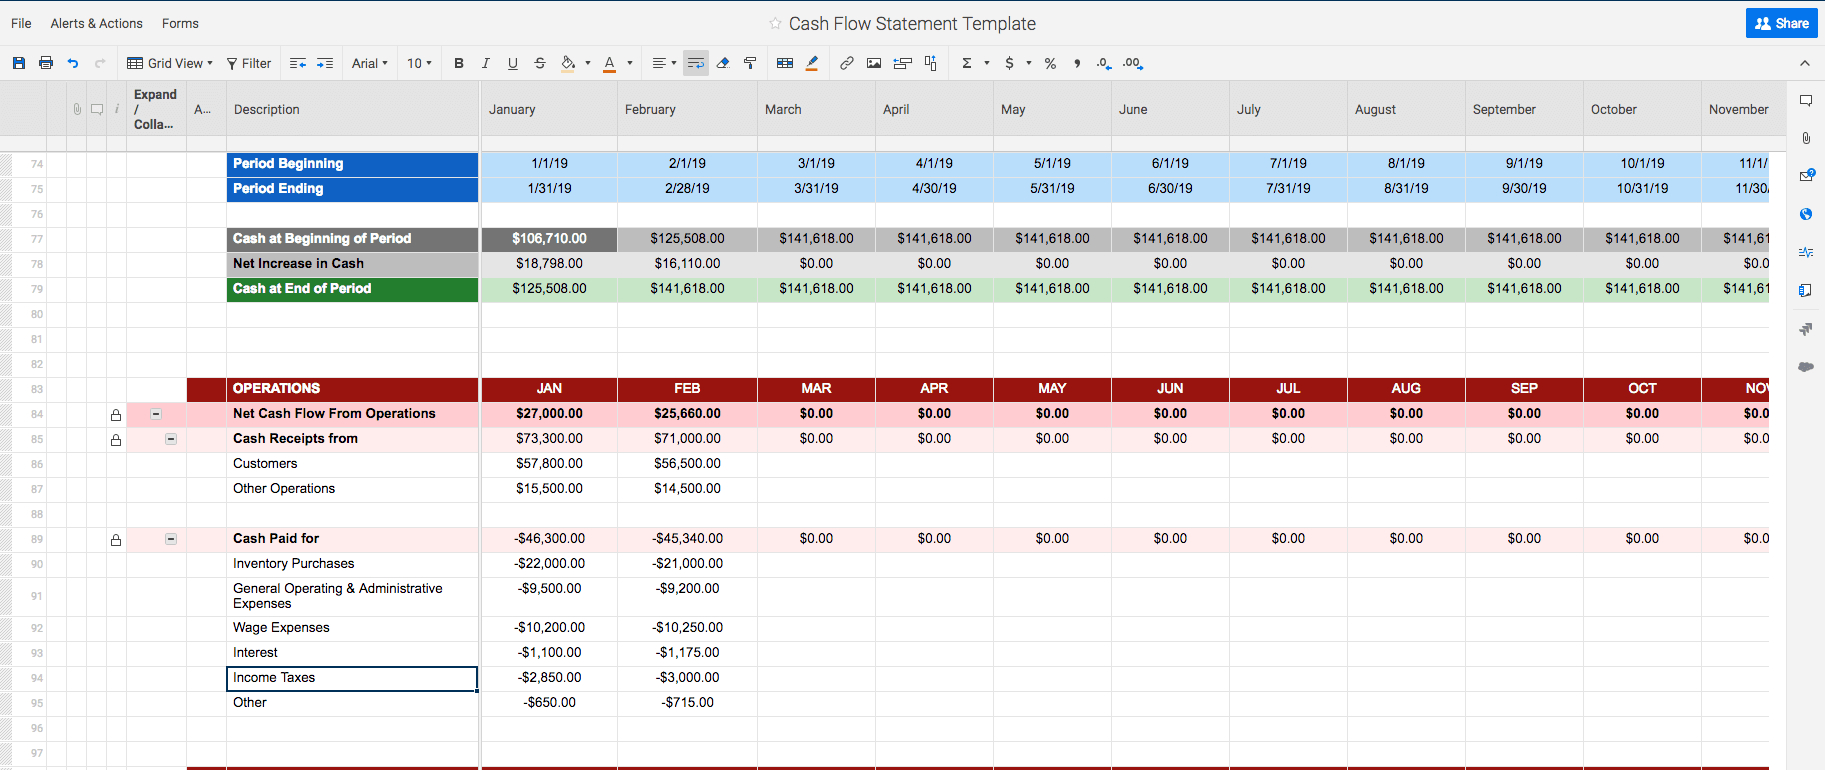 Free Cash Flow Statement Templates | Smartsheet With Regard To Liquidity Report Template